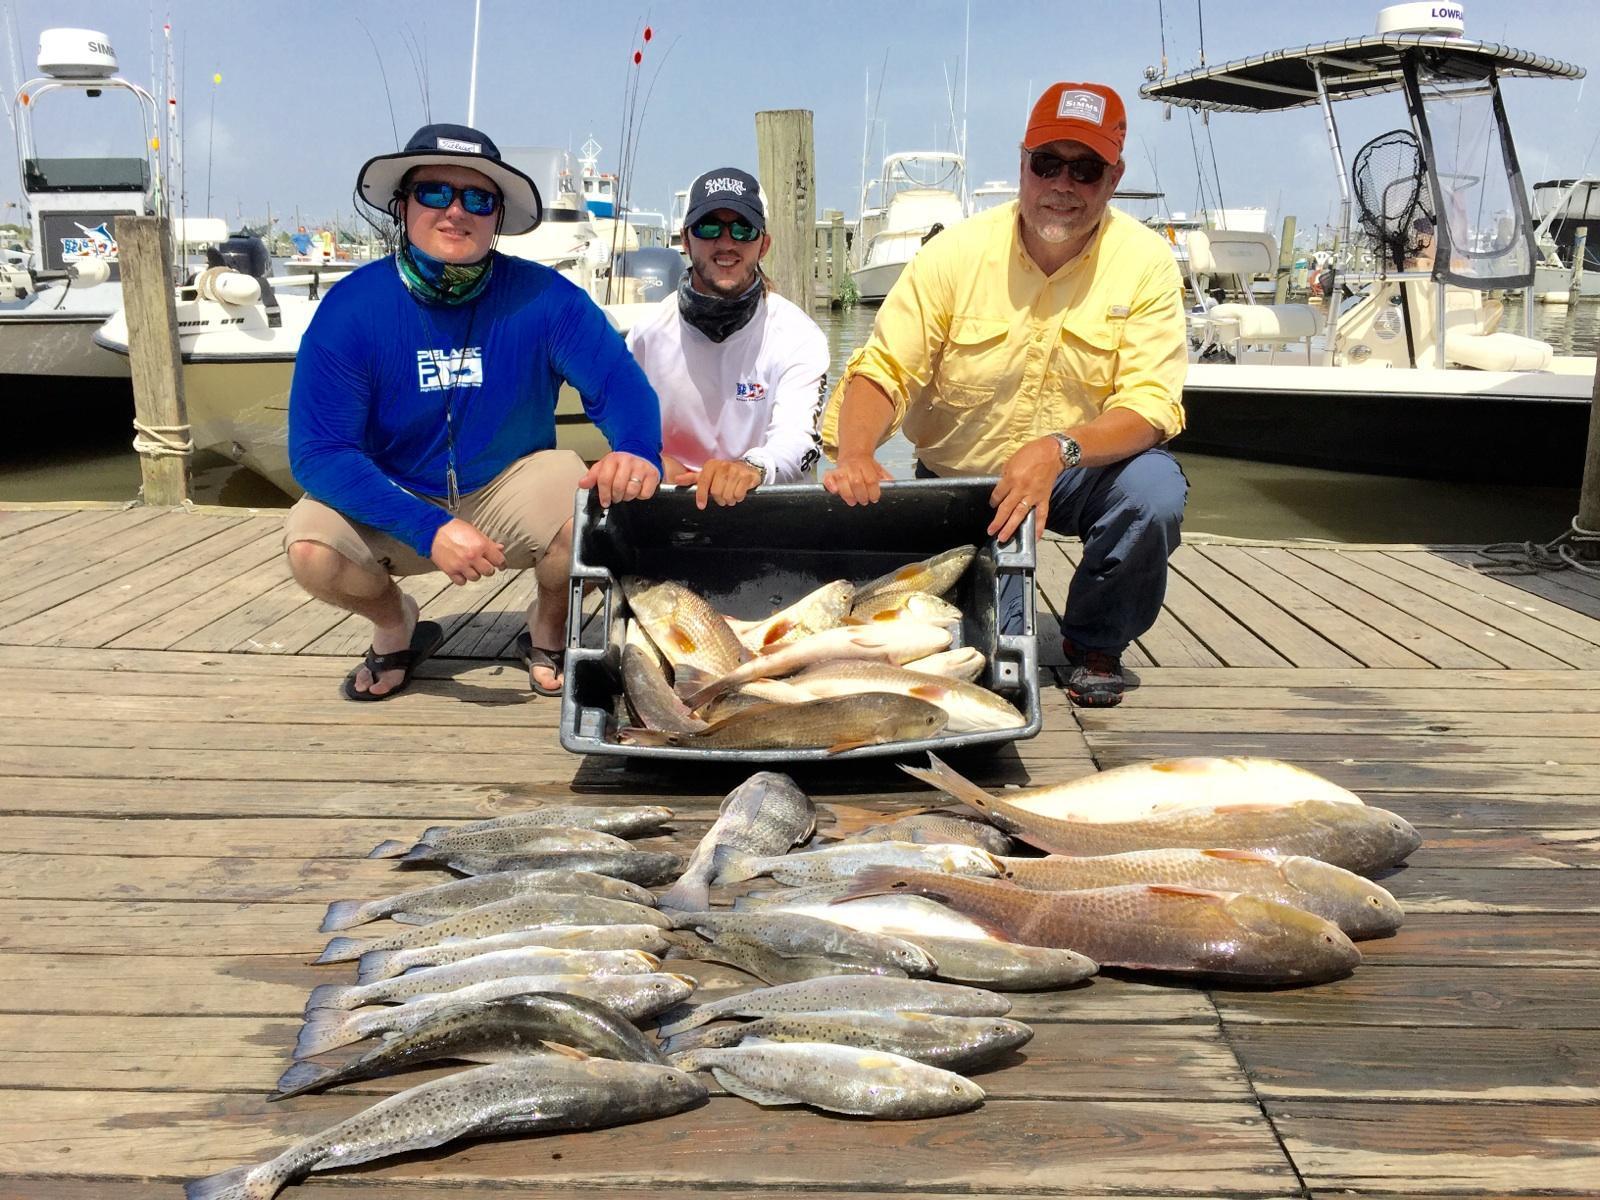 Fishing guide service fishing charters venice la for Venice louisiana fishing lodge